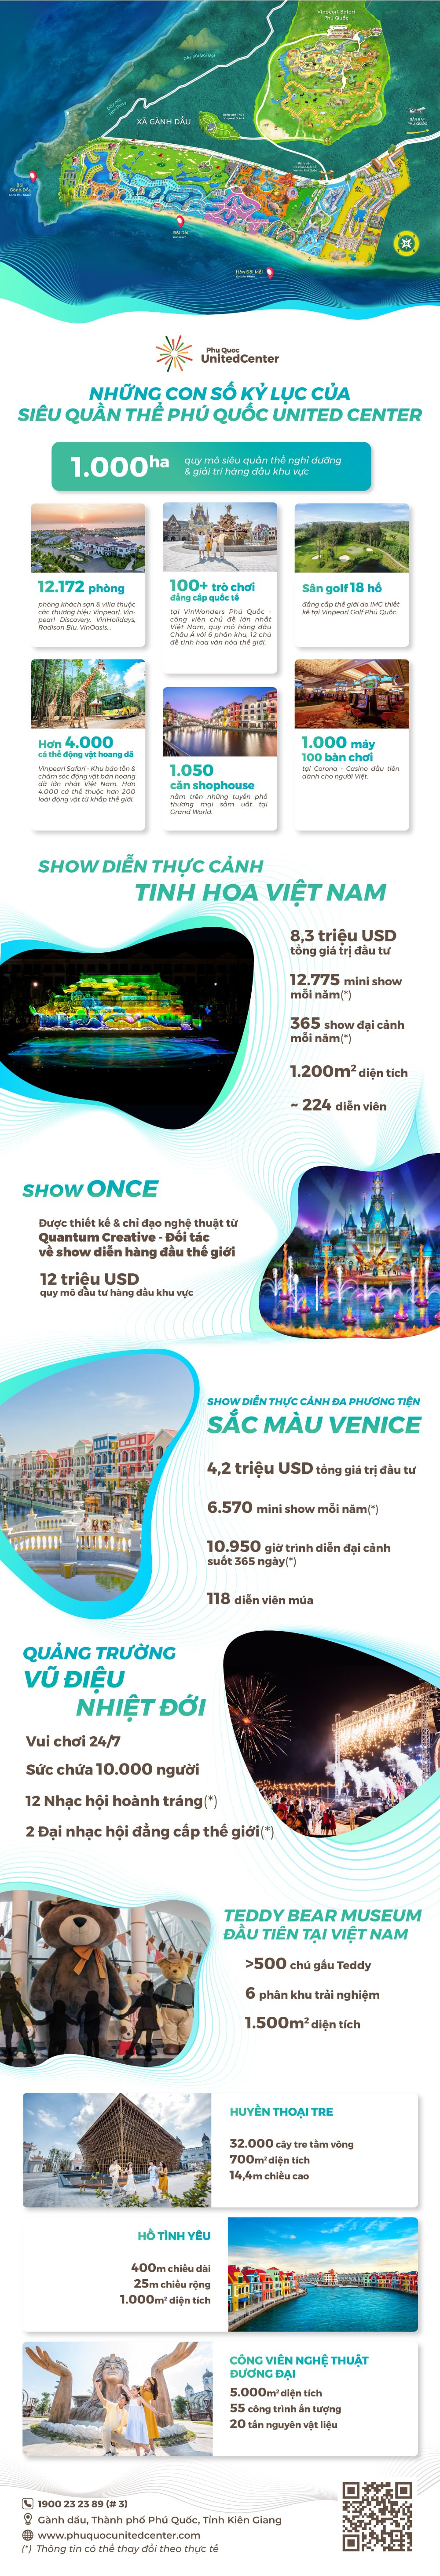 infographic-pquc-edit-min-1616572059.jpg